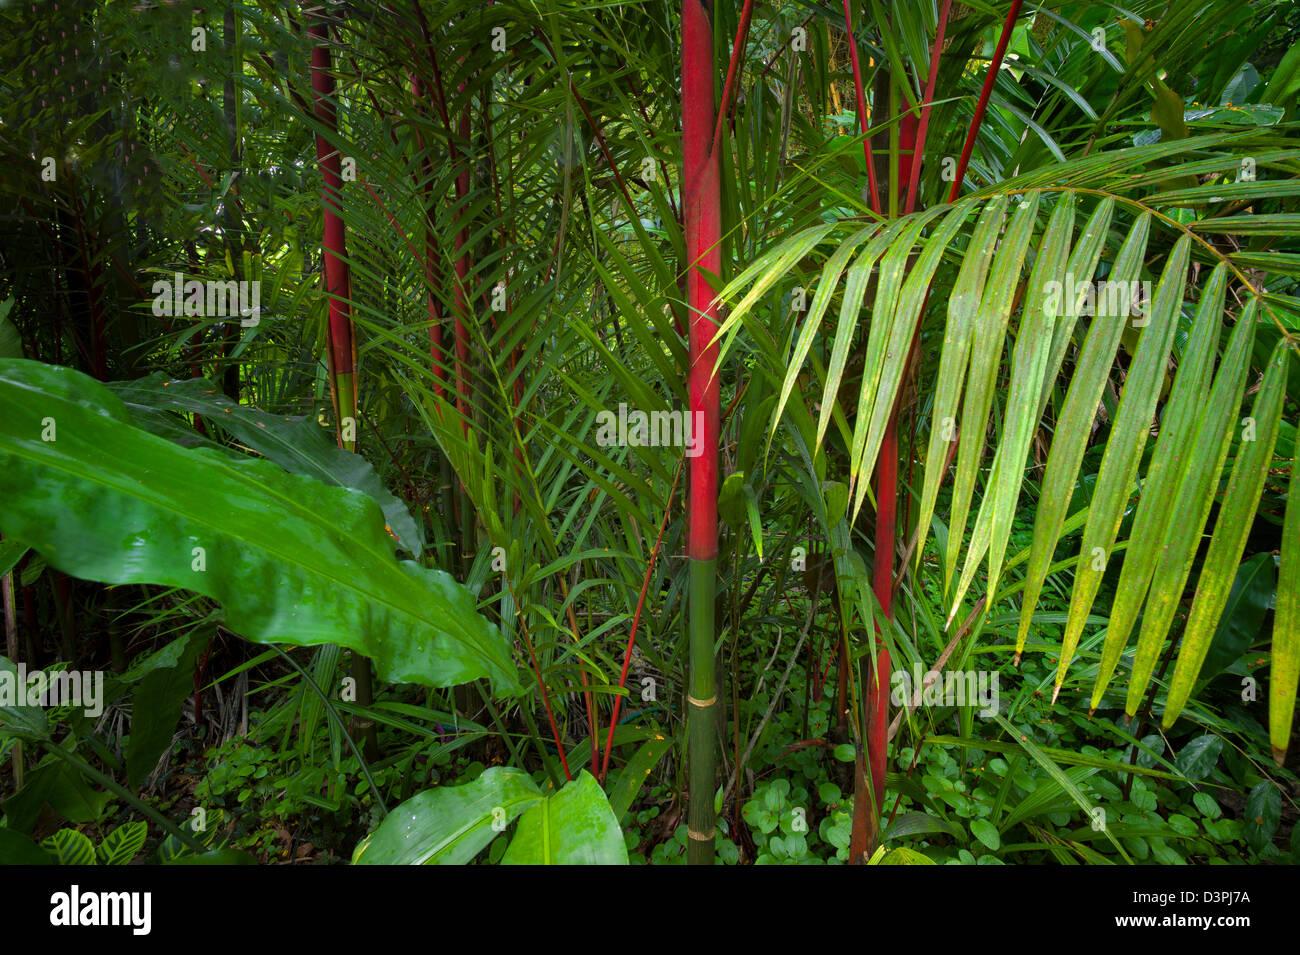 Red trunks of Sealing Wax Palm. Hawaii Tropical Botanical Gardens. Hawaii, The Big Island. - Stock Image